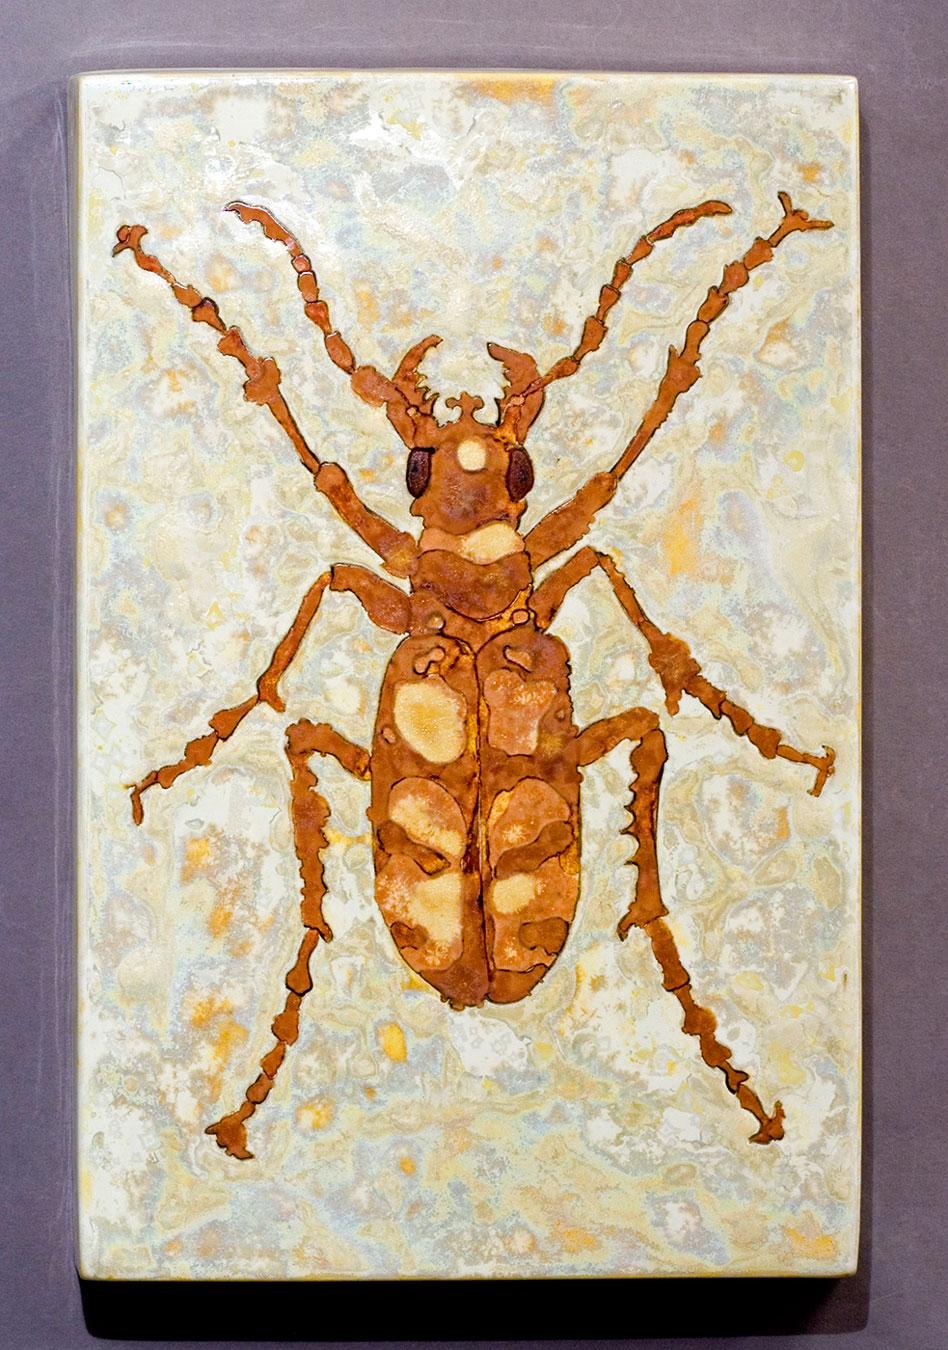 Brown-Beetle-Art-Samantha-Henneke-Seagrove-Pottery-North-Carolina.jpg